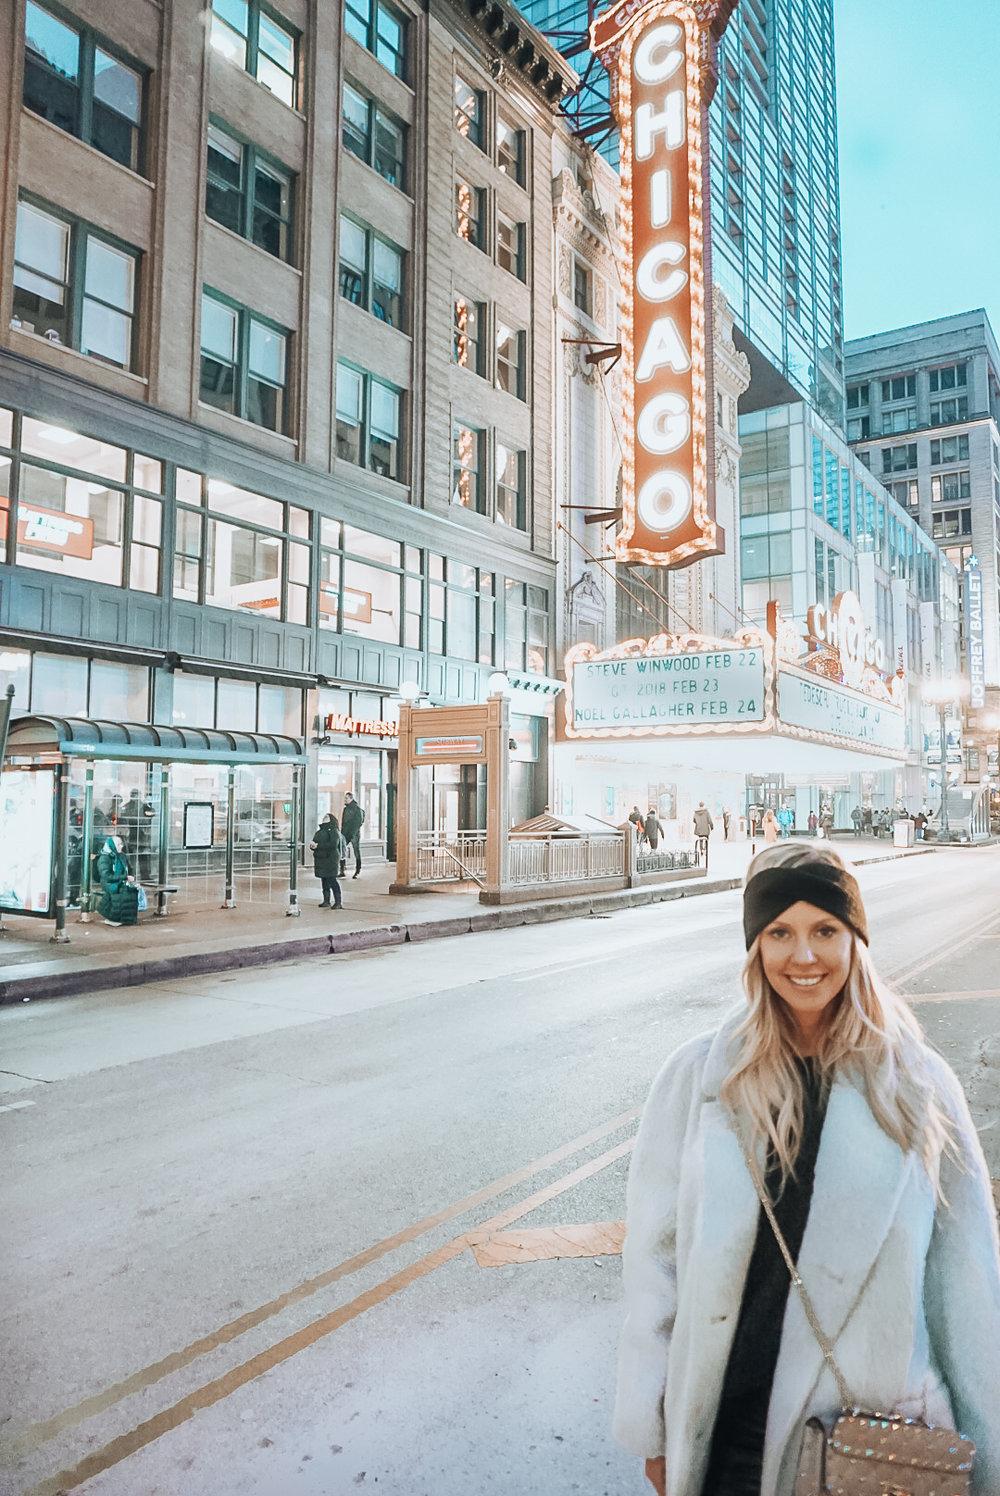 chicago theater.jpg